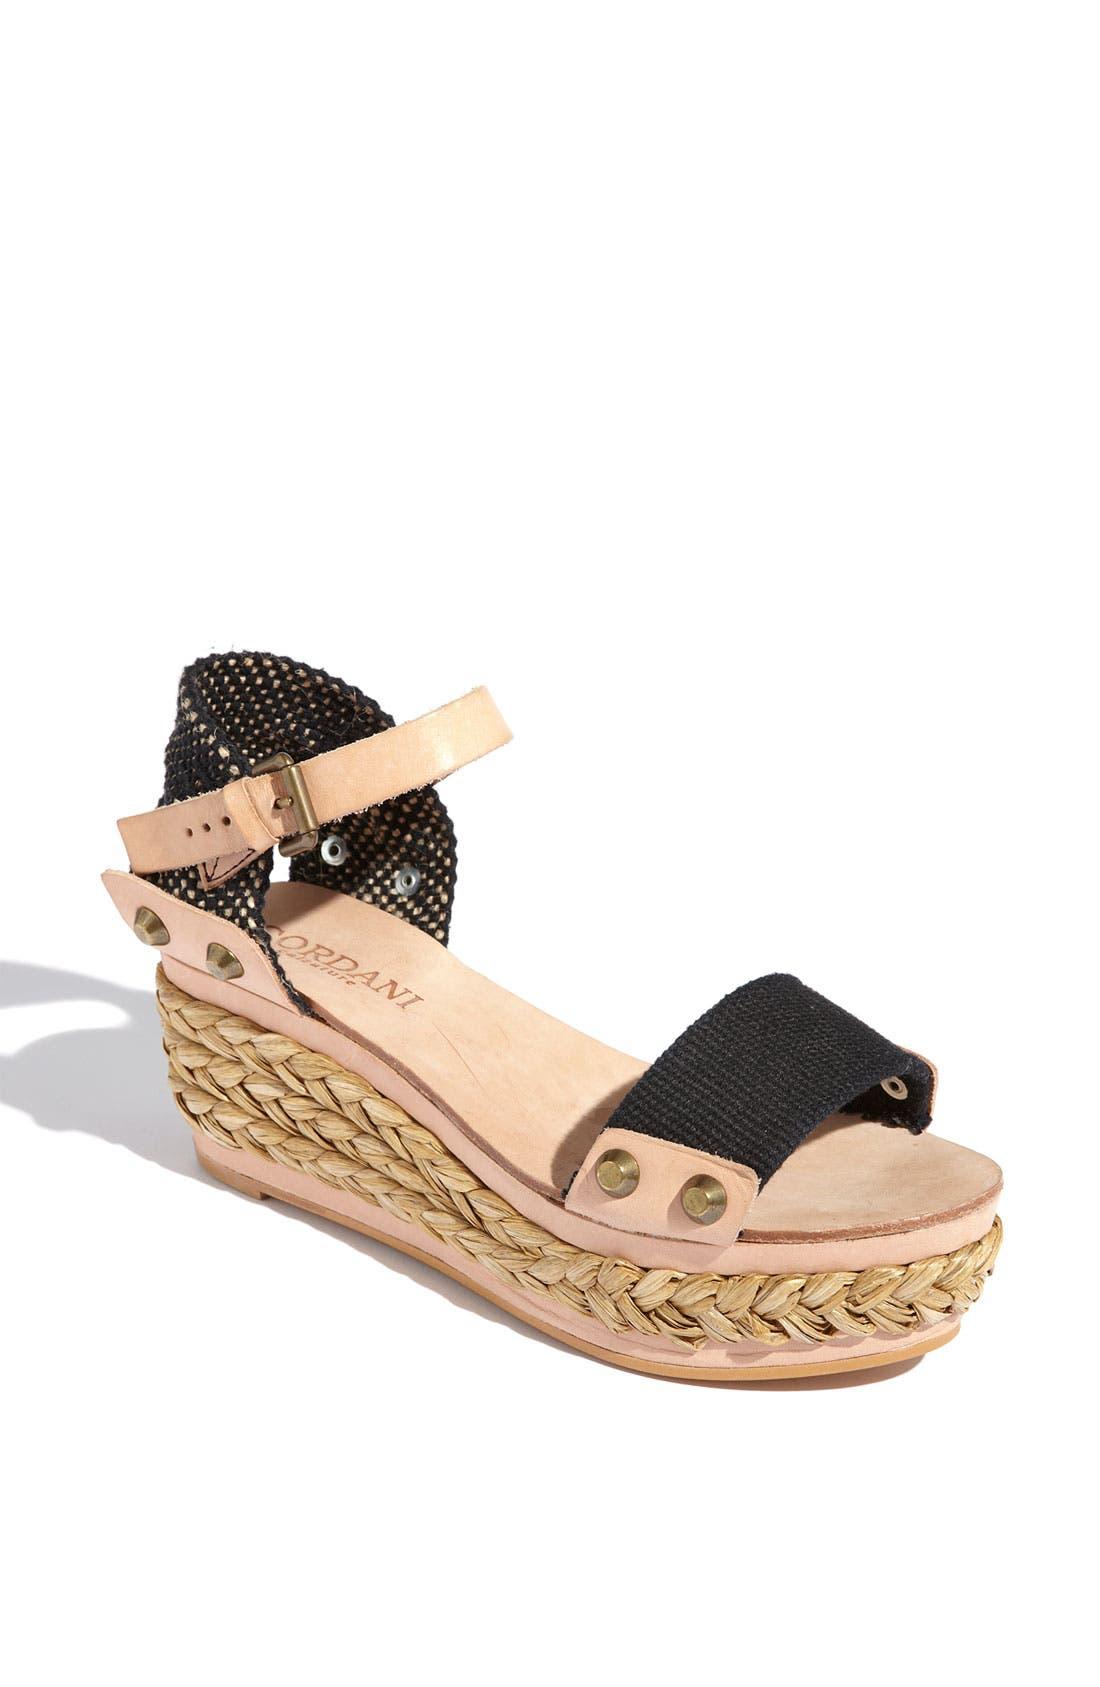 Alternate Image 1 Selected - Cordani 'Jameson' Sandal